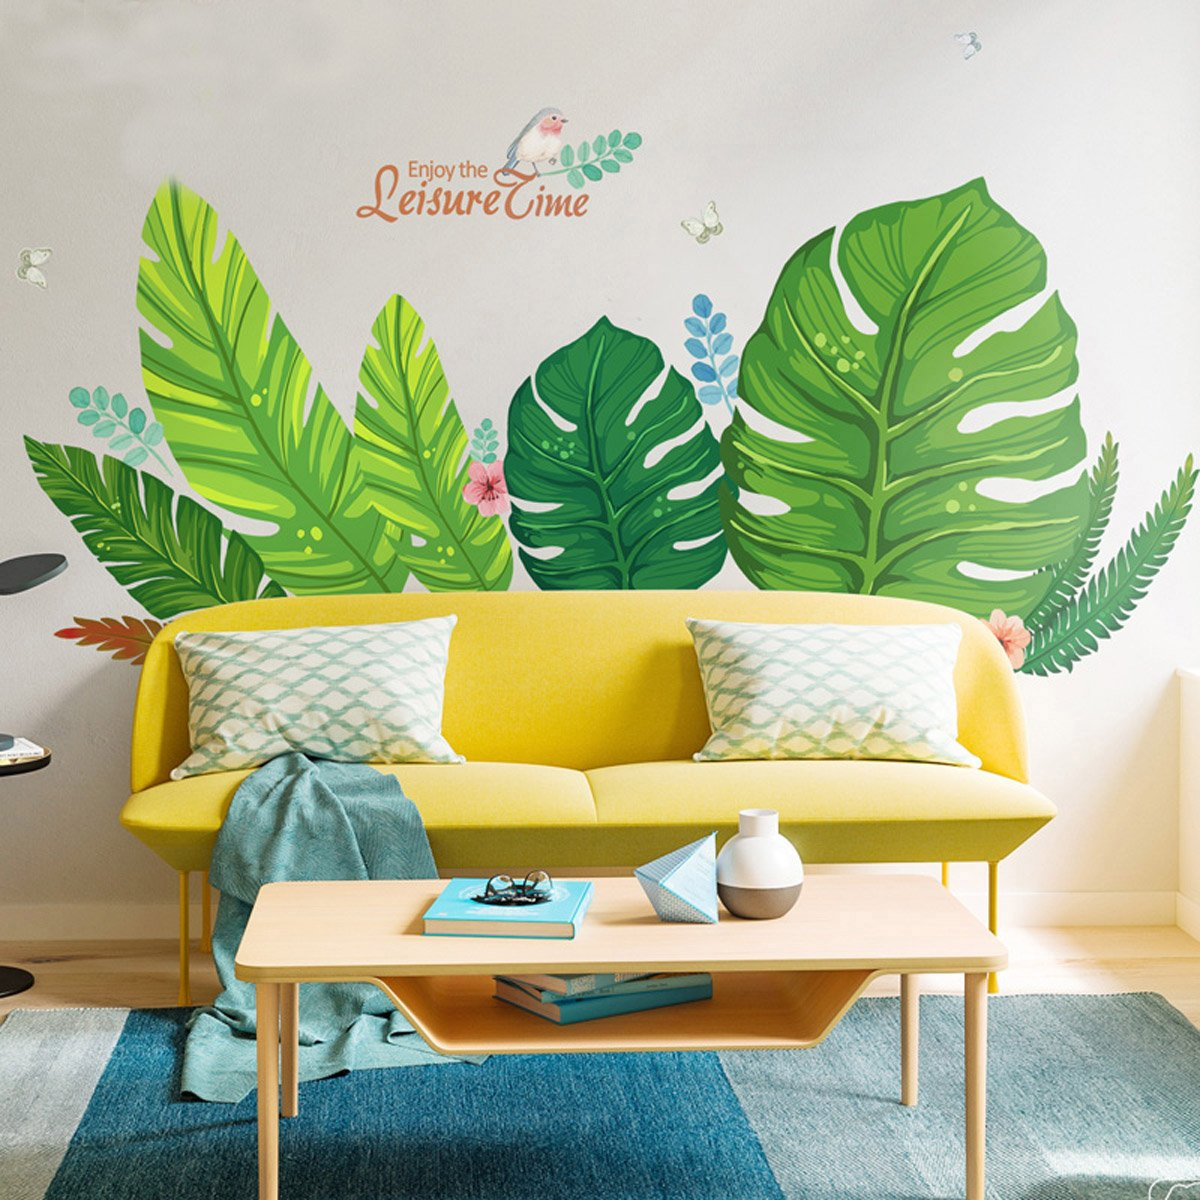 Amazon.com: YIHOPAINTI DIY Removable Wall Decal Stickers Love Palm ...